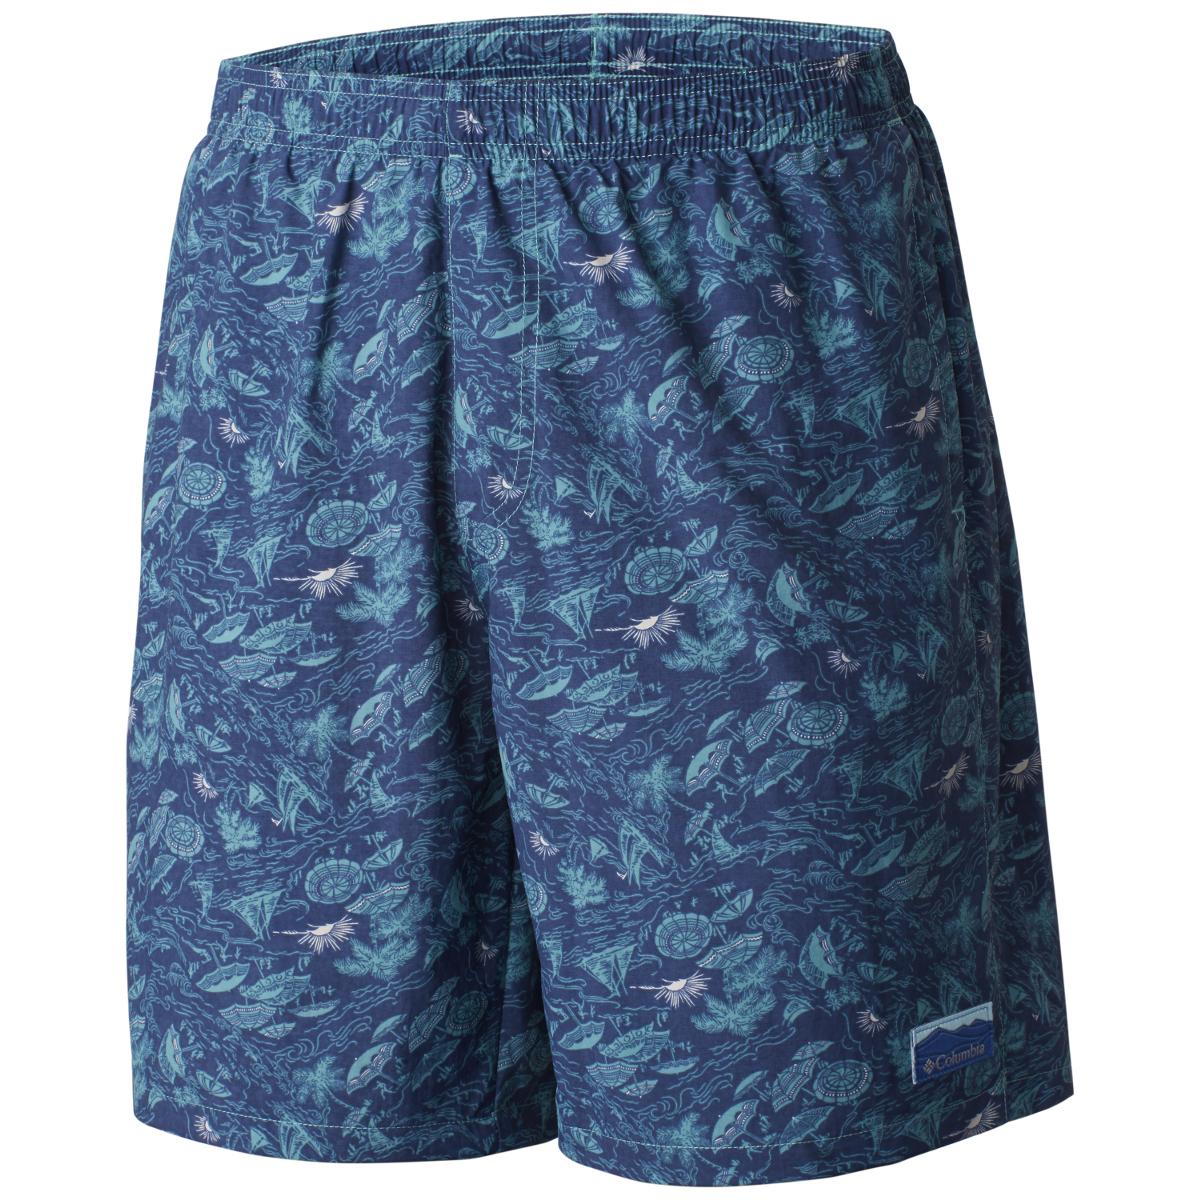 Columbia Men's Big Dippers Water Shorts - Green, XL